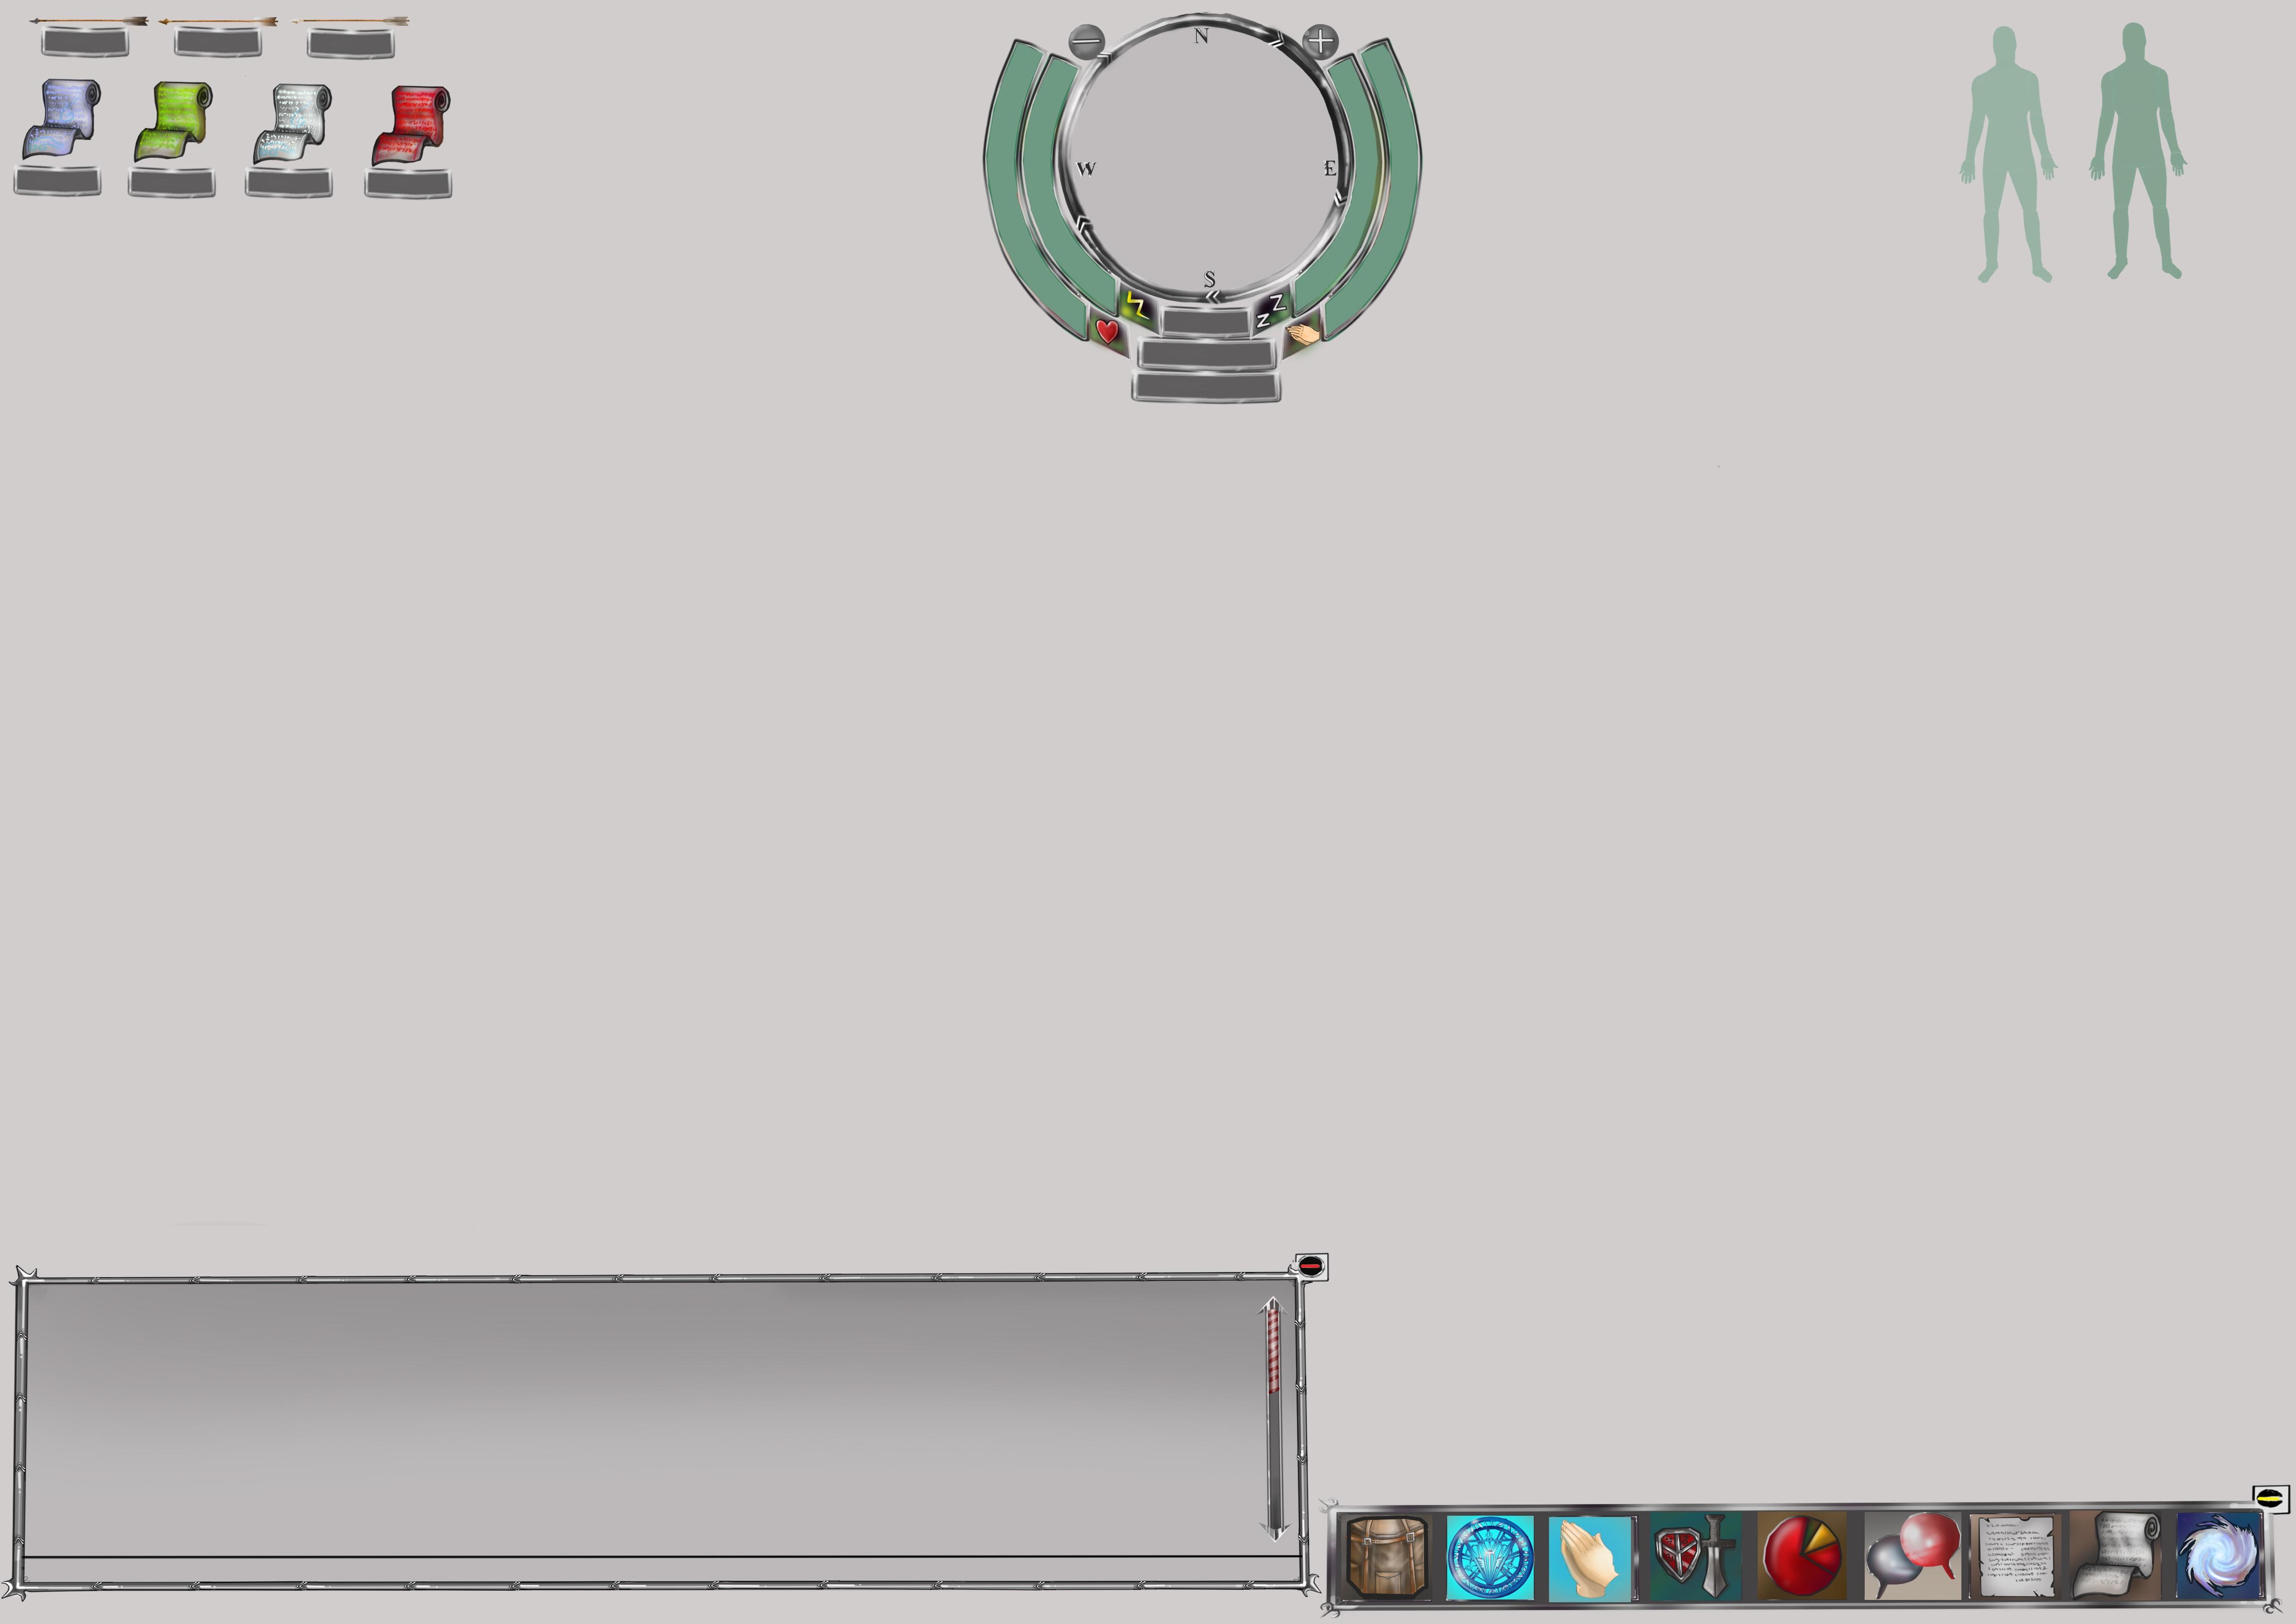 Vortex Online Large Image